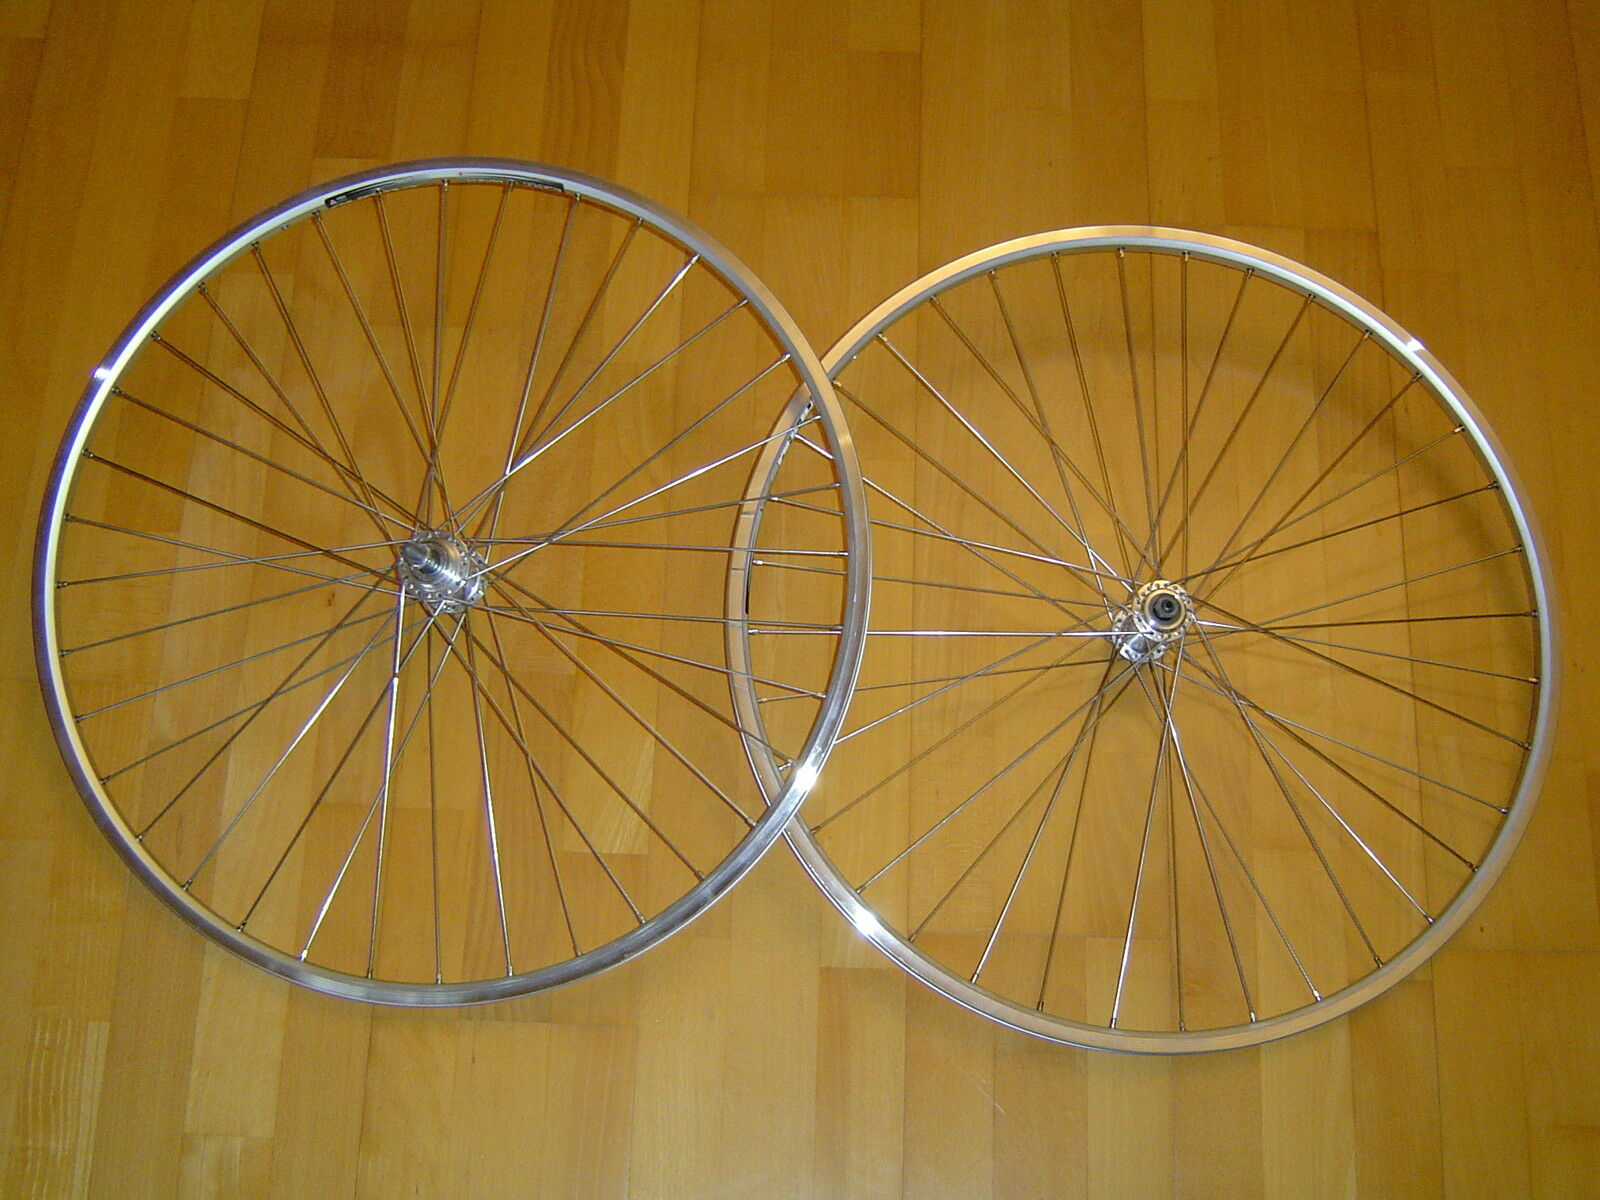 28  ruedas bicicleta de carreras schraubkranz buje 6-7 veces plata nuevo